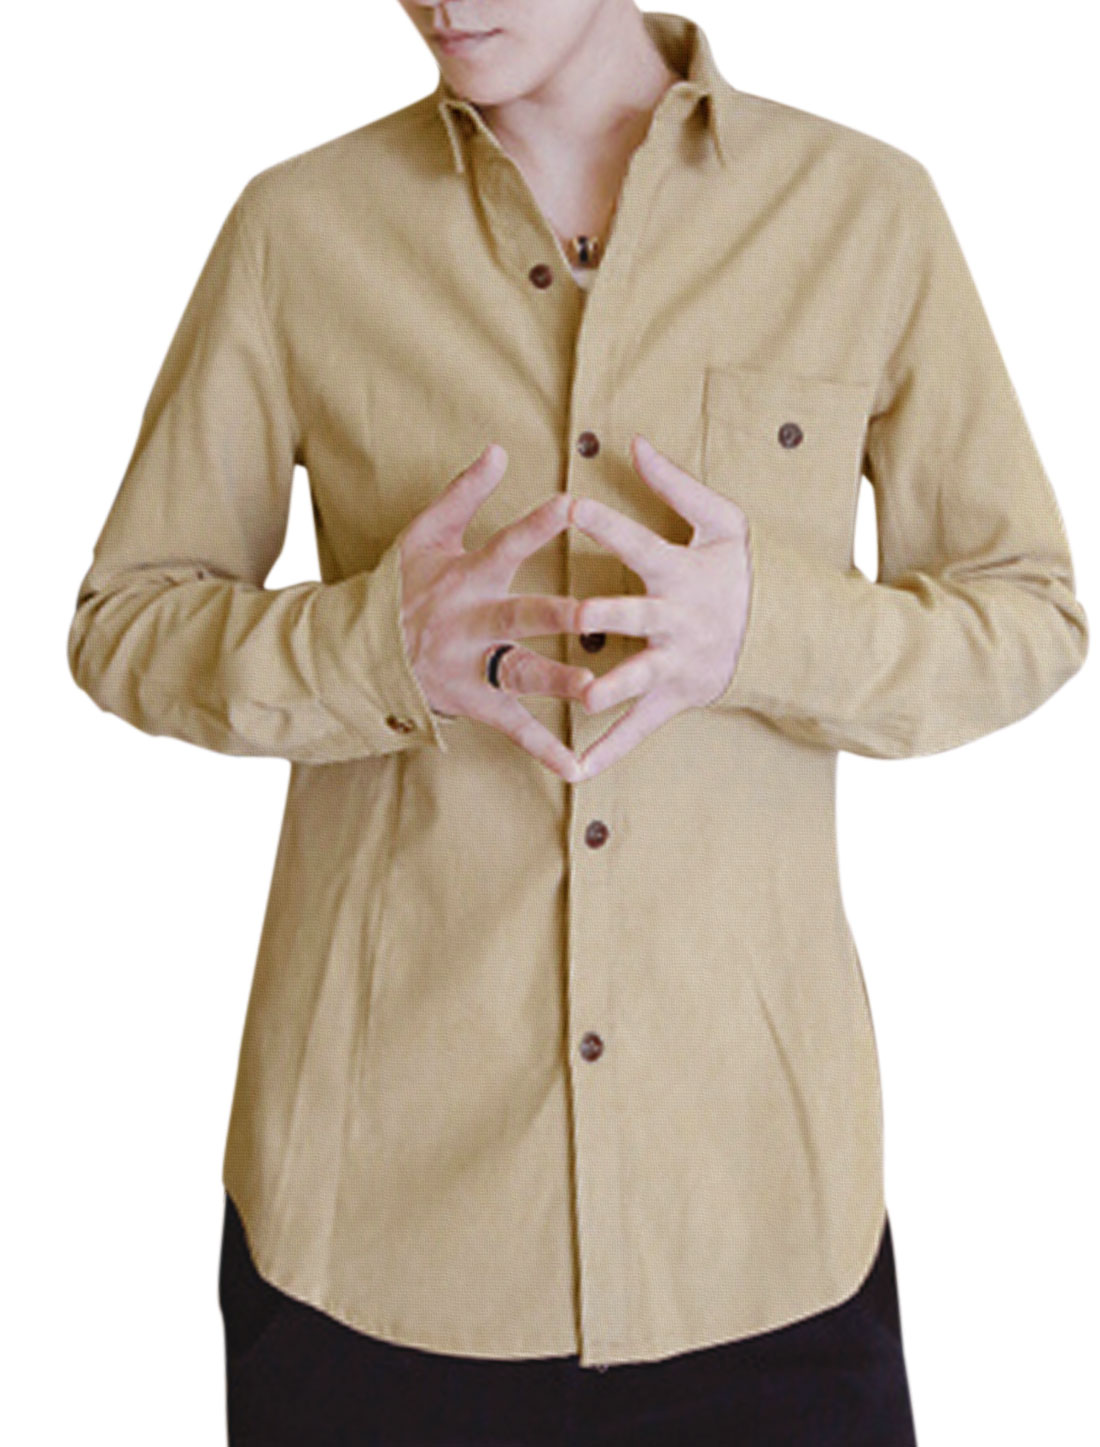 Man Roll-up Long Sleeves Point Collar Khaki Corduroy Shirt S